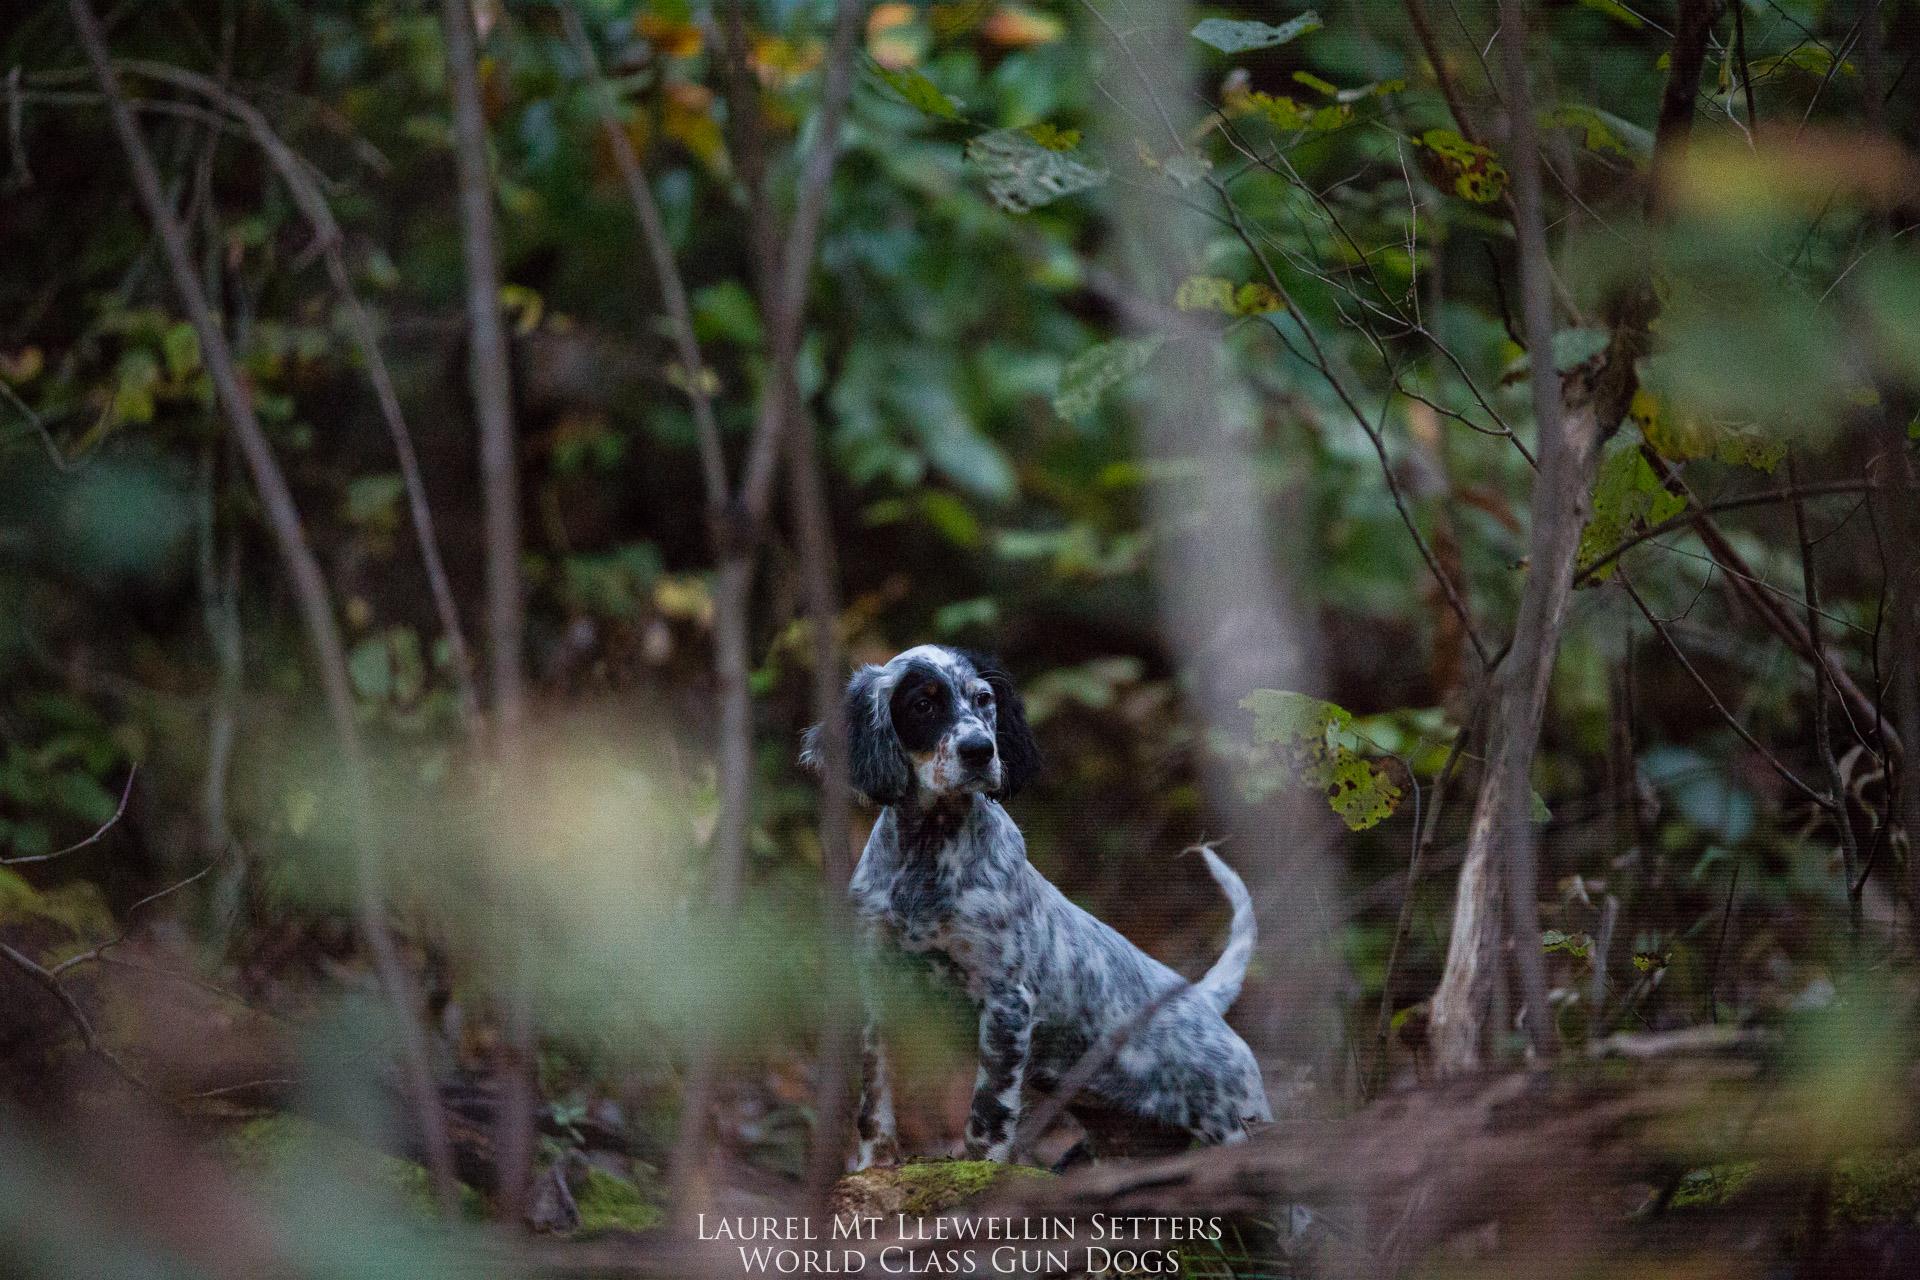 Laurel Mt Llewellin Setter Puppy, Aspen